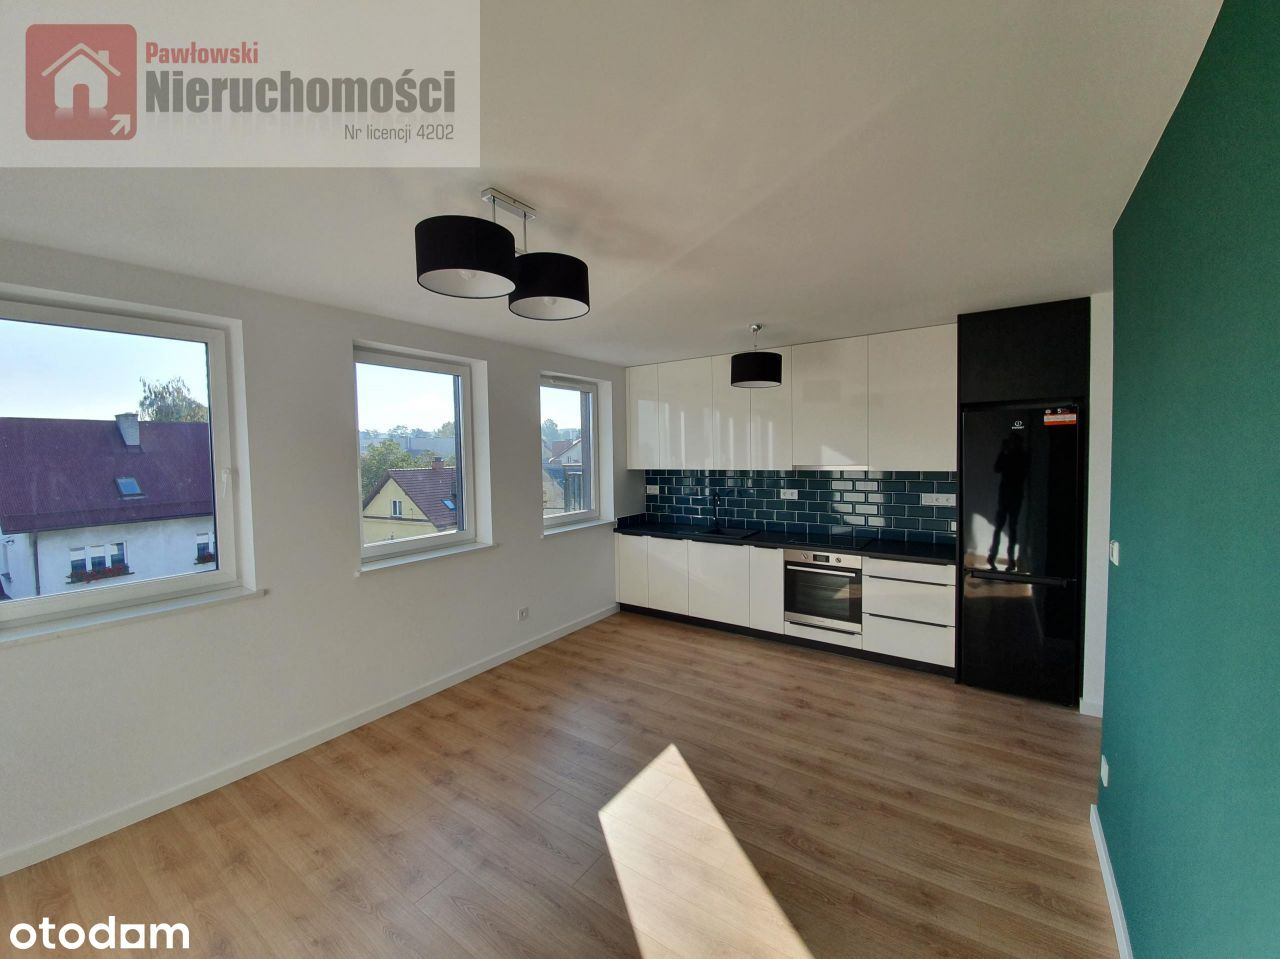 Mieszkanie, 59 m², Skawina